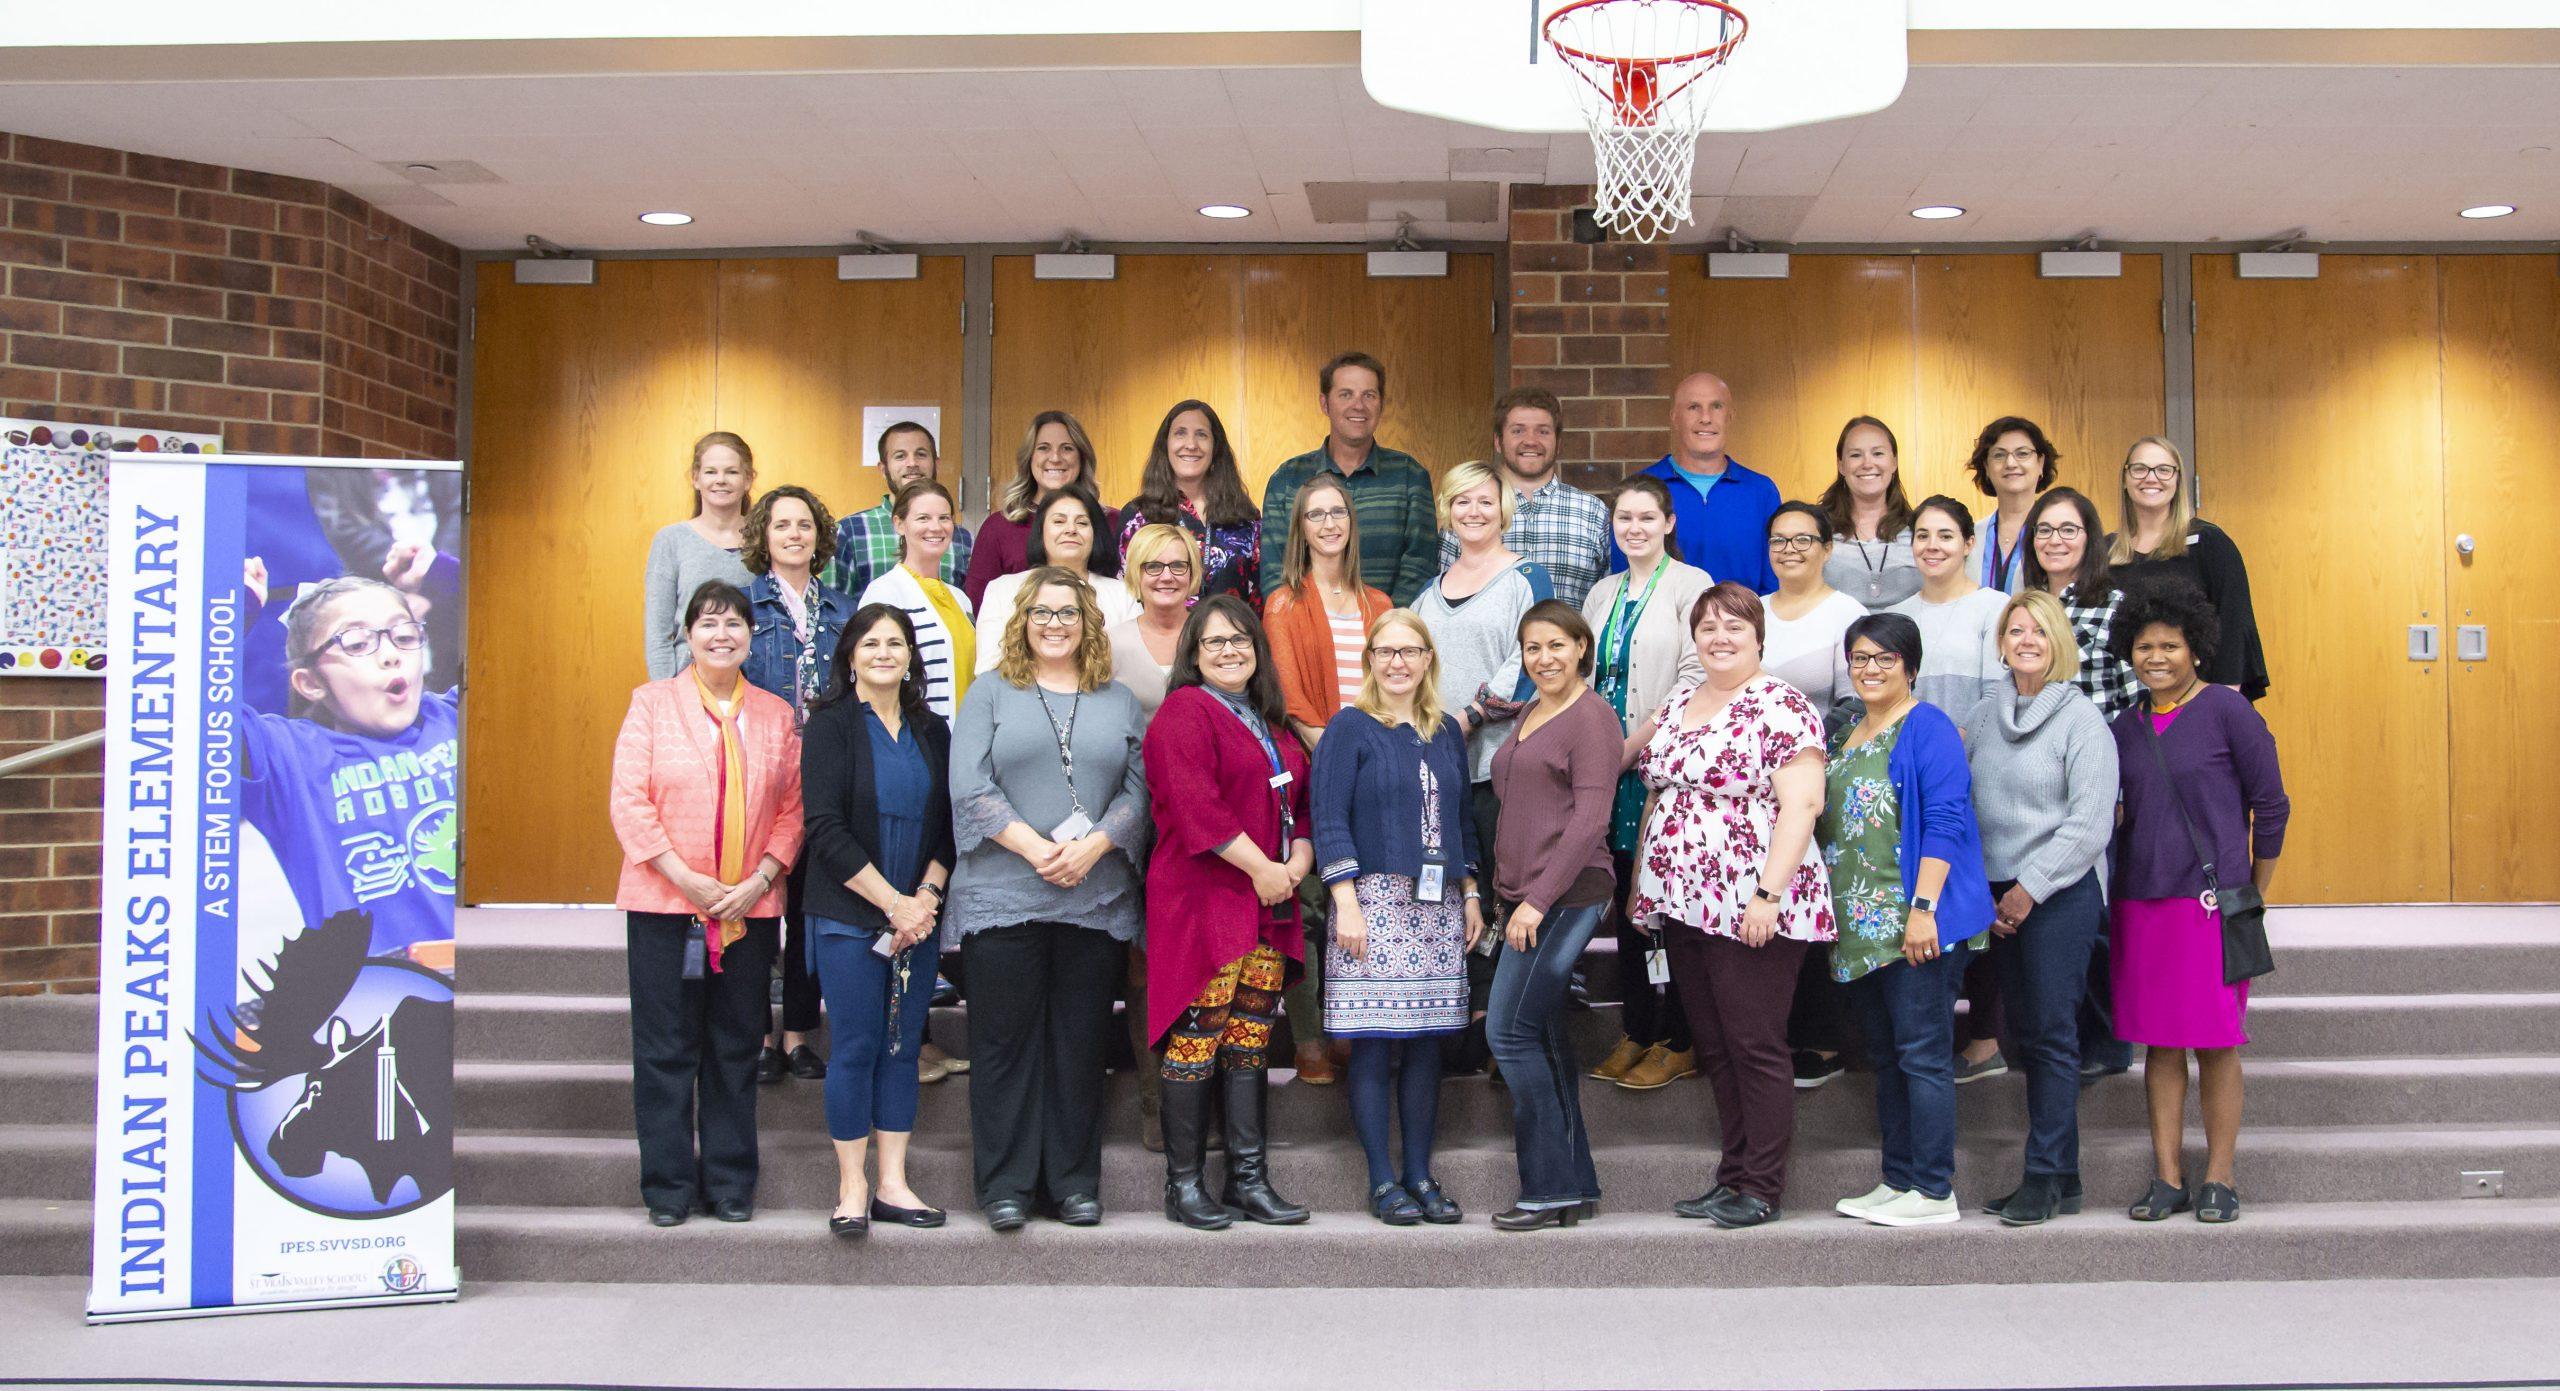 Indian Peaks Elementary School Staff